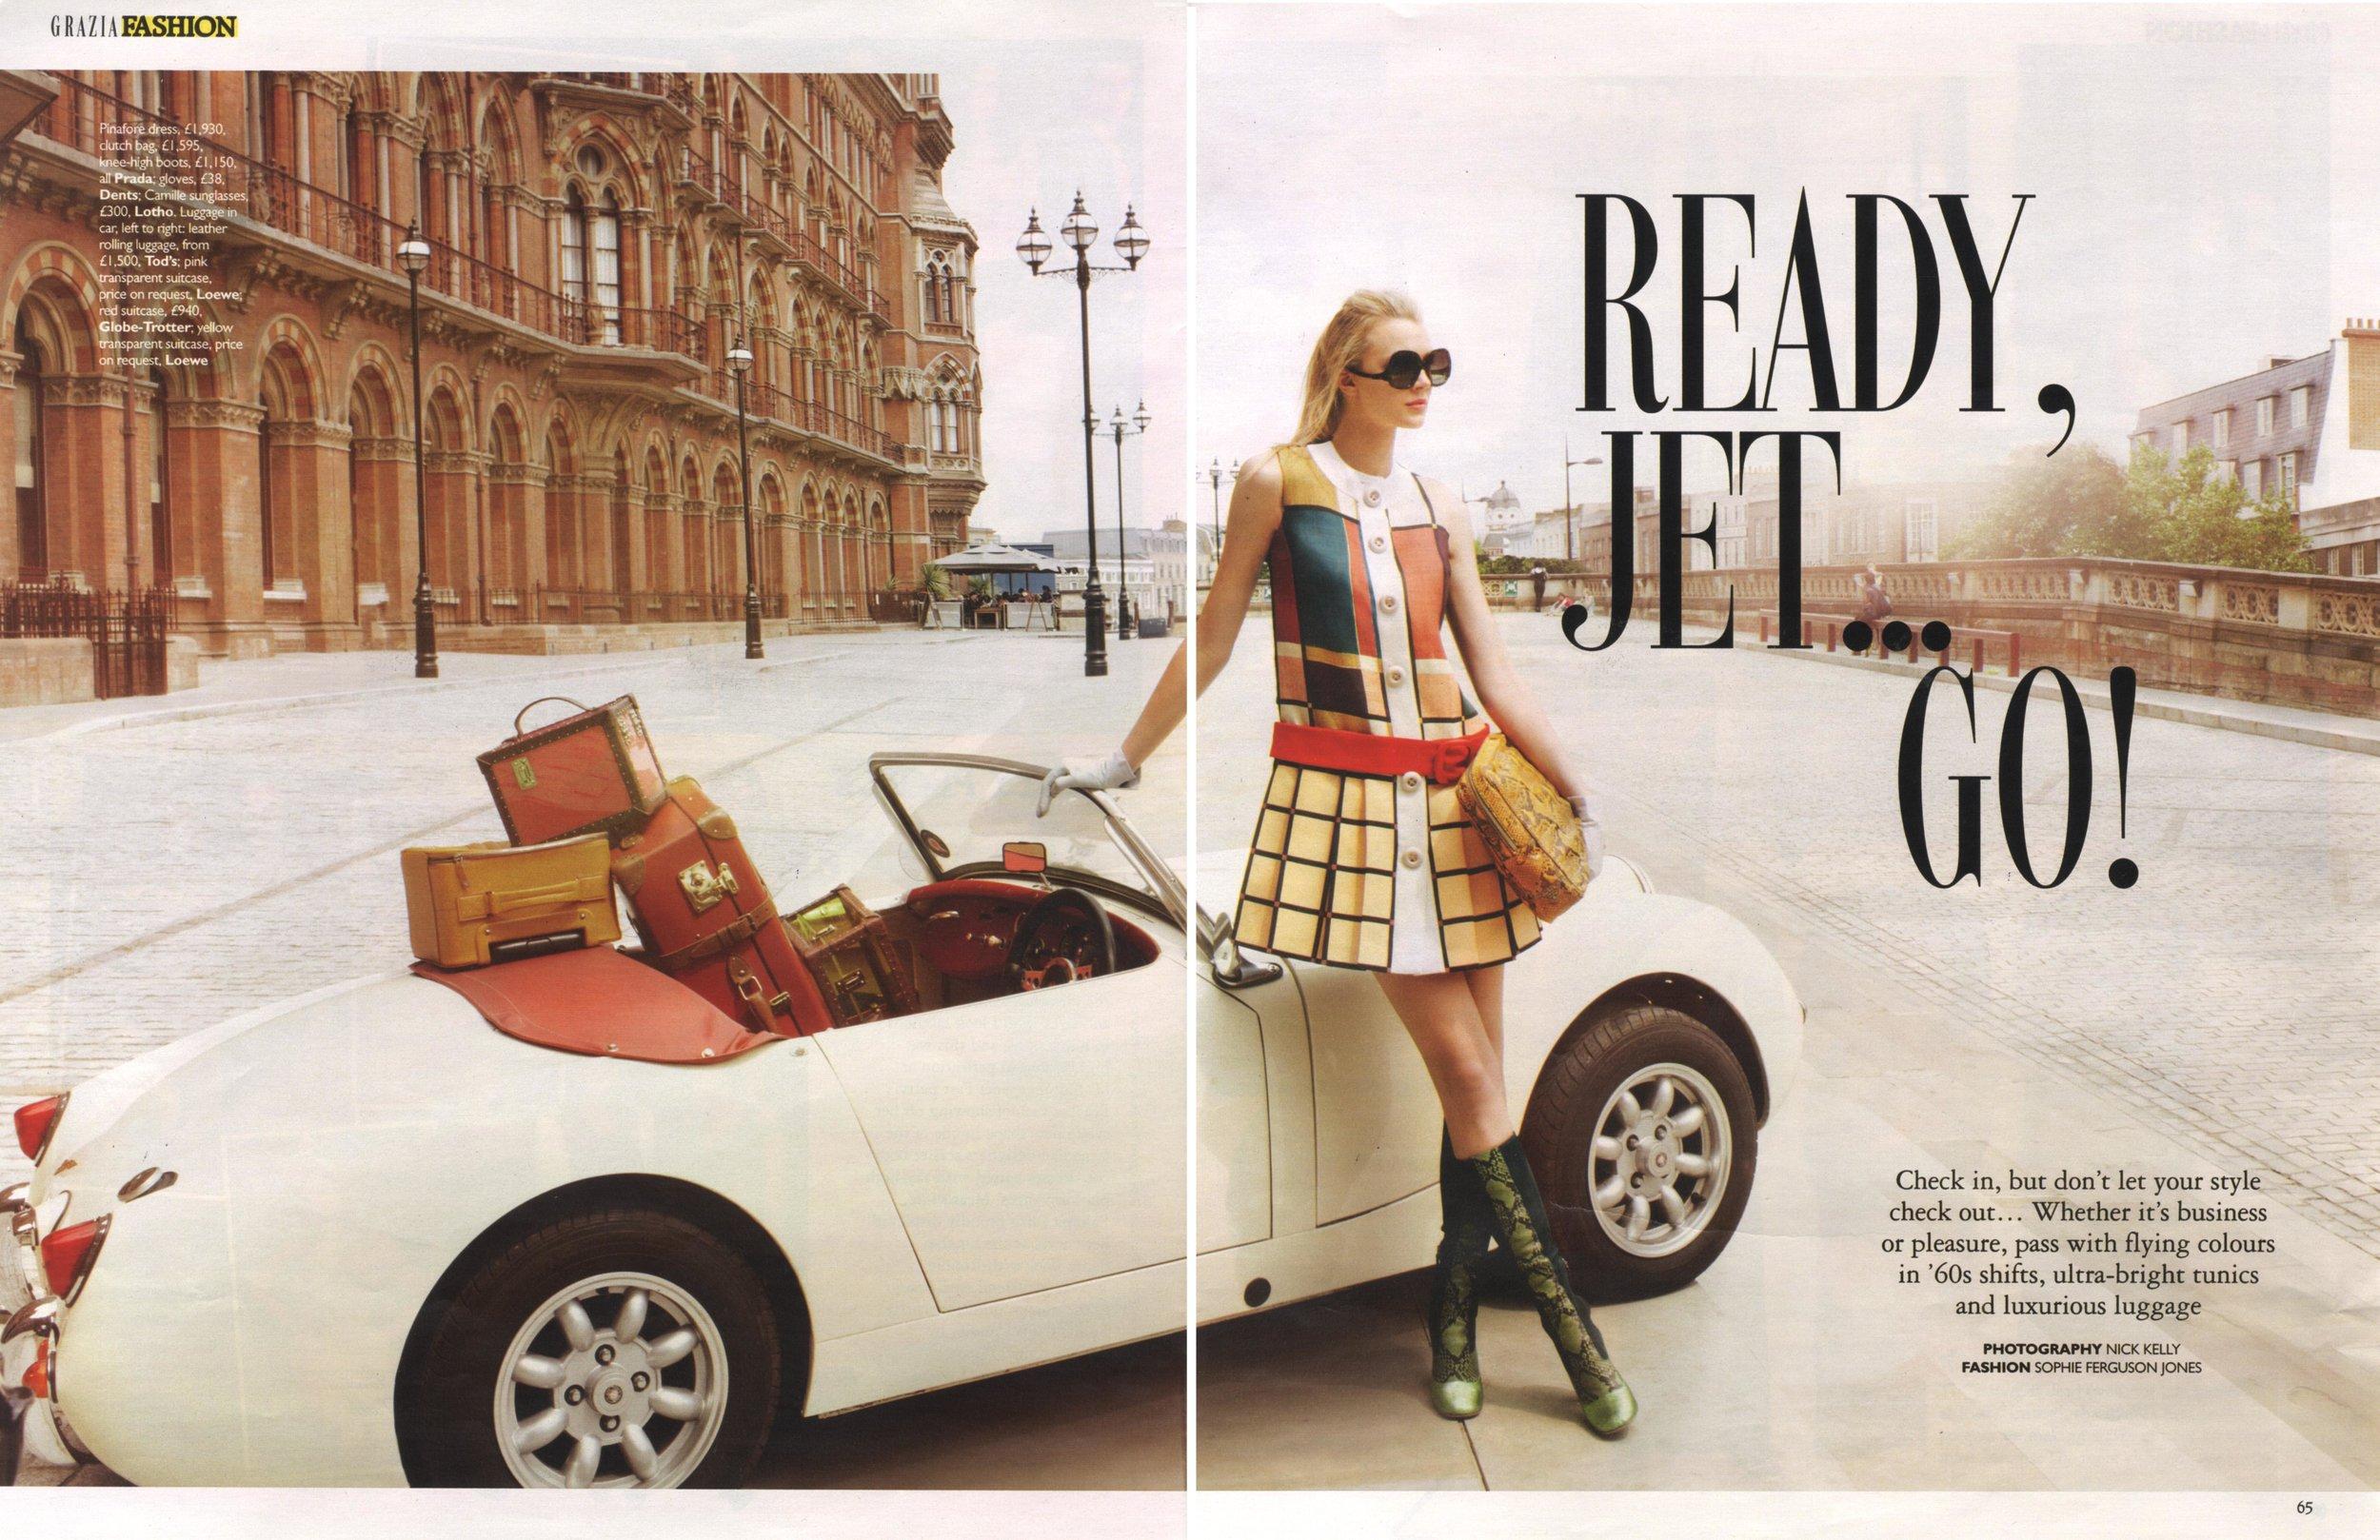 jayne moore for grazia kings cross st pancras renovation london sixties style vintage car old london meets new london